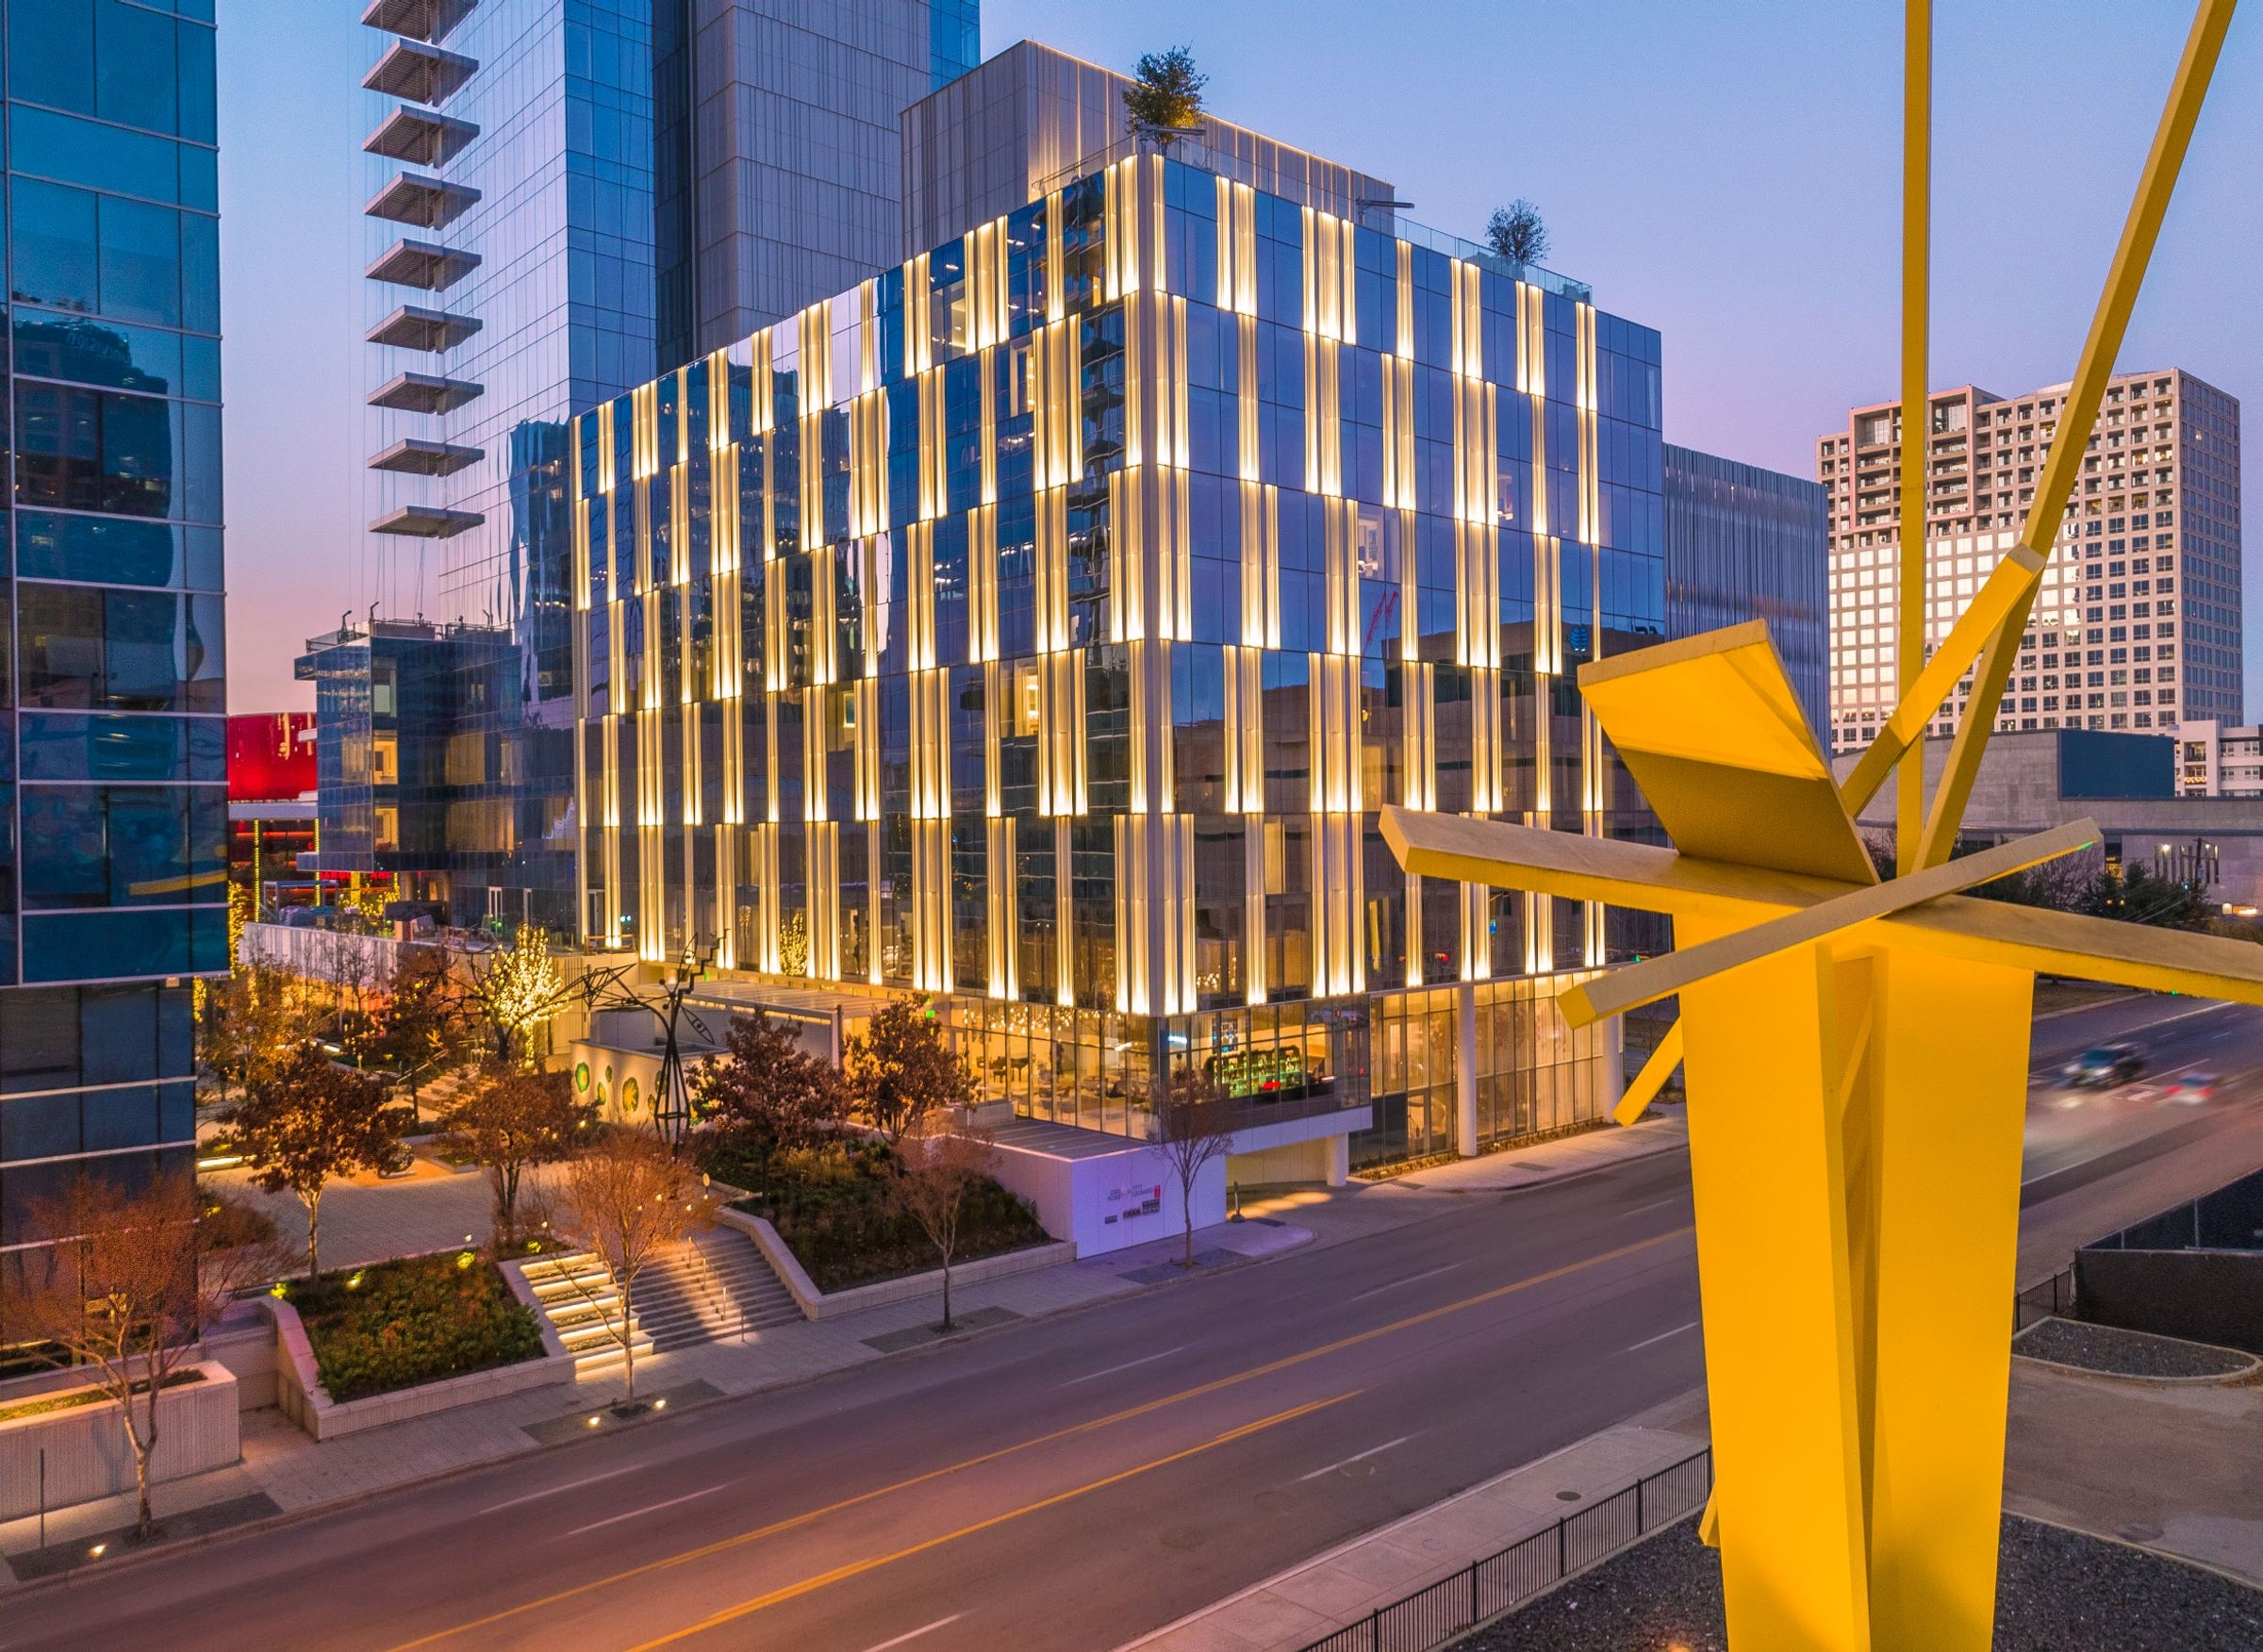 HALL Arts Hotel in Beyond Dallas